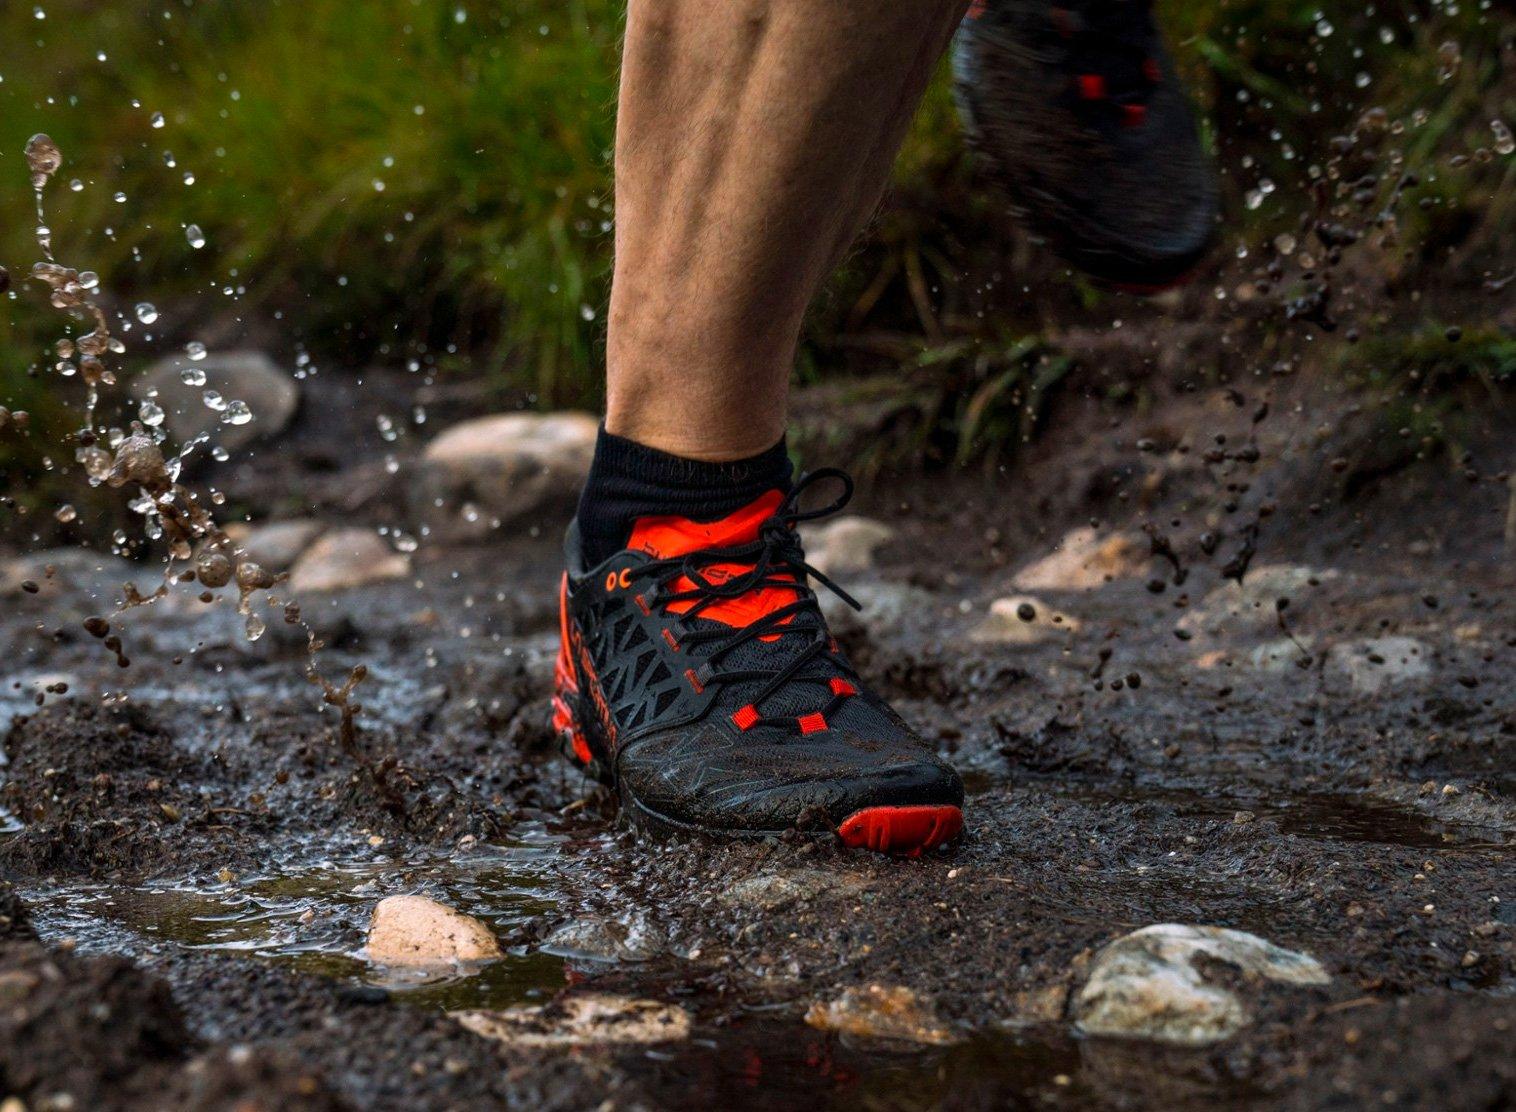 La Sportiva's Bushido II Trail Runner is Built for Battle at werd.com